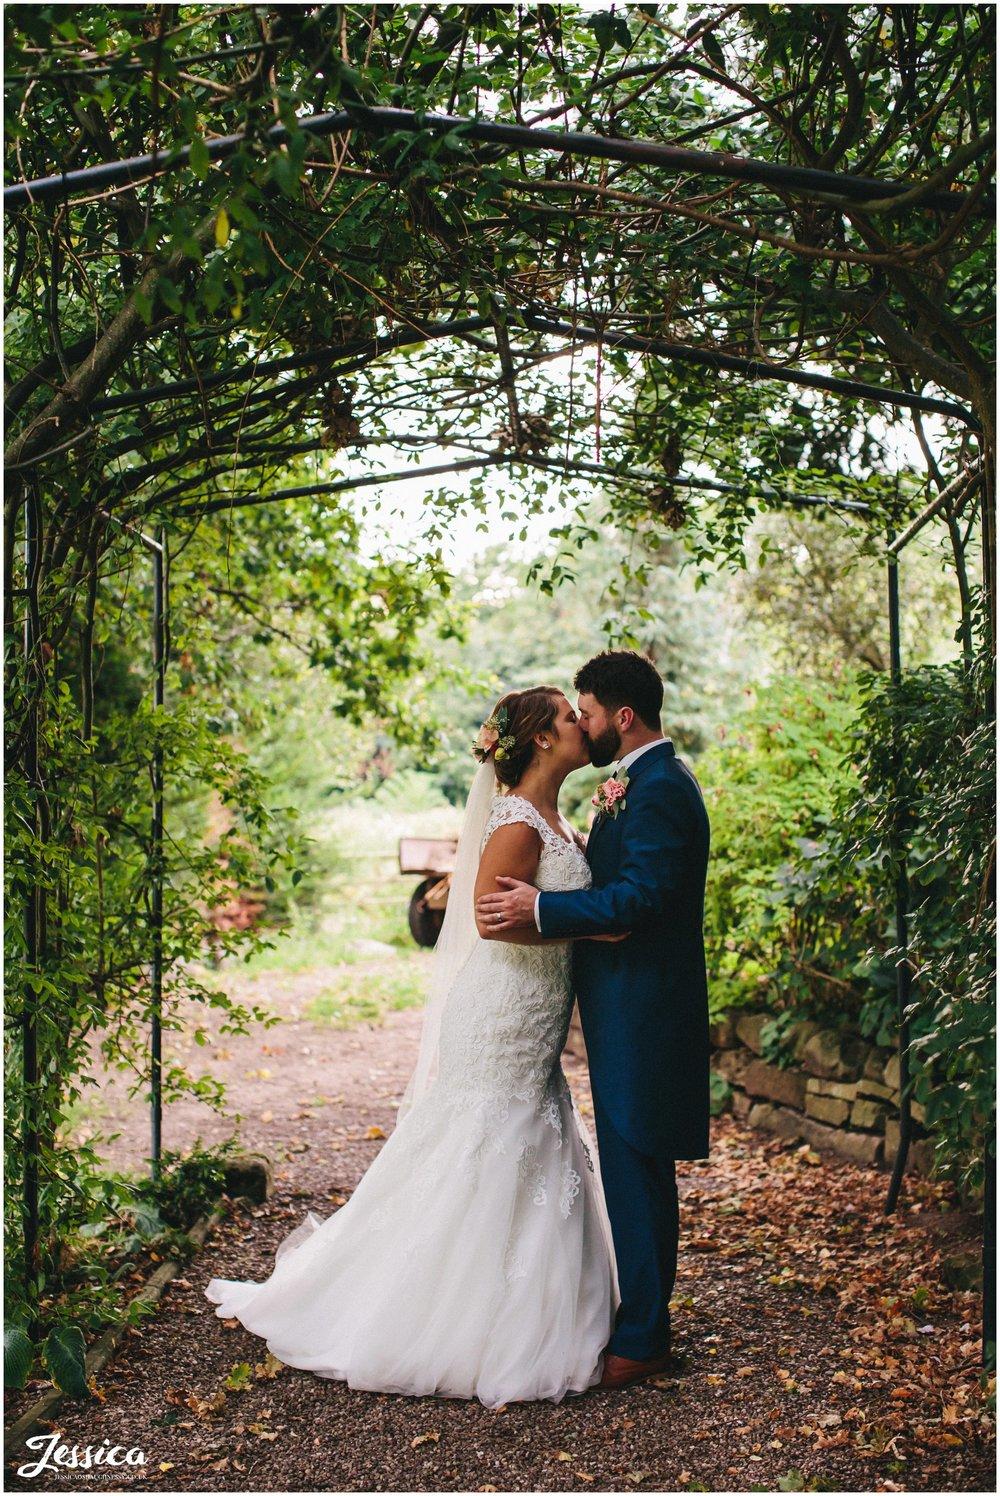 willington hall wedding - couple kiss under archway